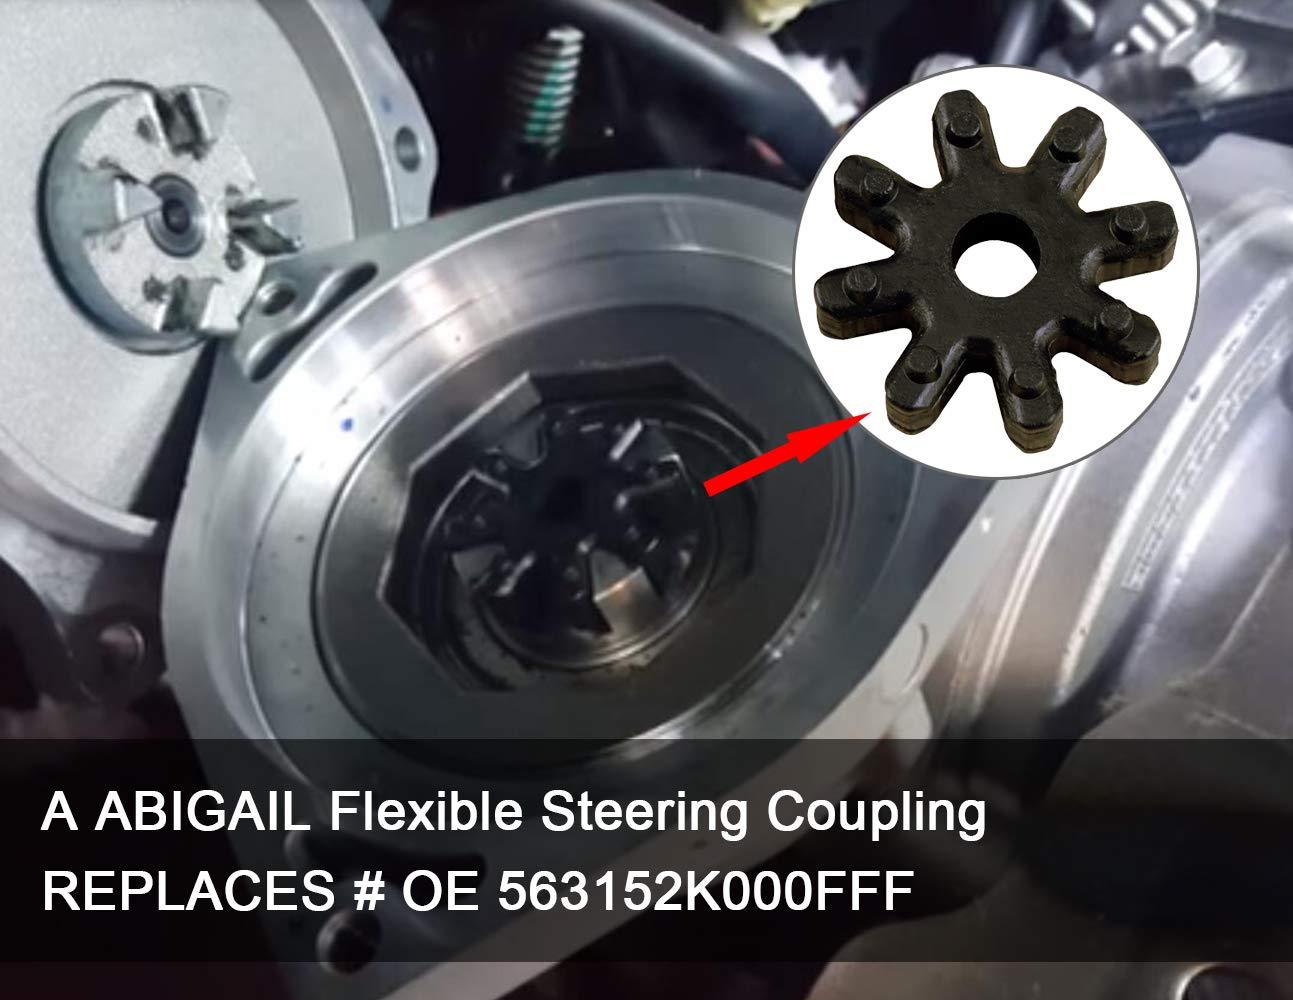 Flexible Steering Coupler Column Motor MDPS Clunk Noise Rubber Flex Coupling Repair for Hyundai Sonata Elantra Santa Fe Azera Veloster Kia Soul Optima Forte Cadenza Replaces 56330-4Z000 563152K000FFF